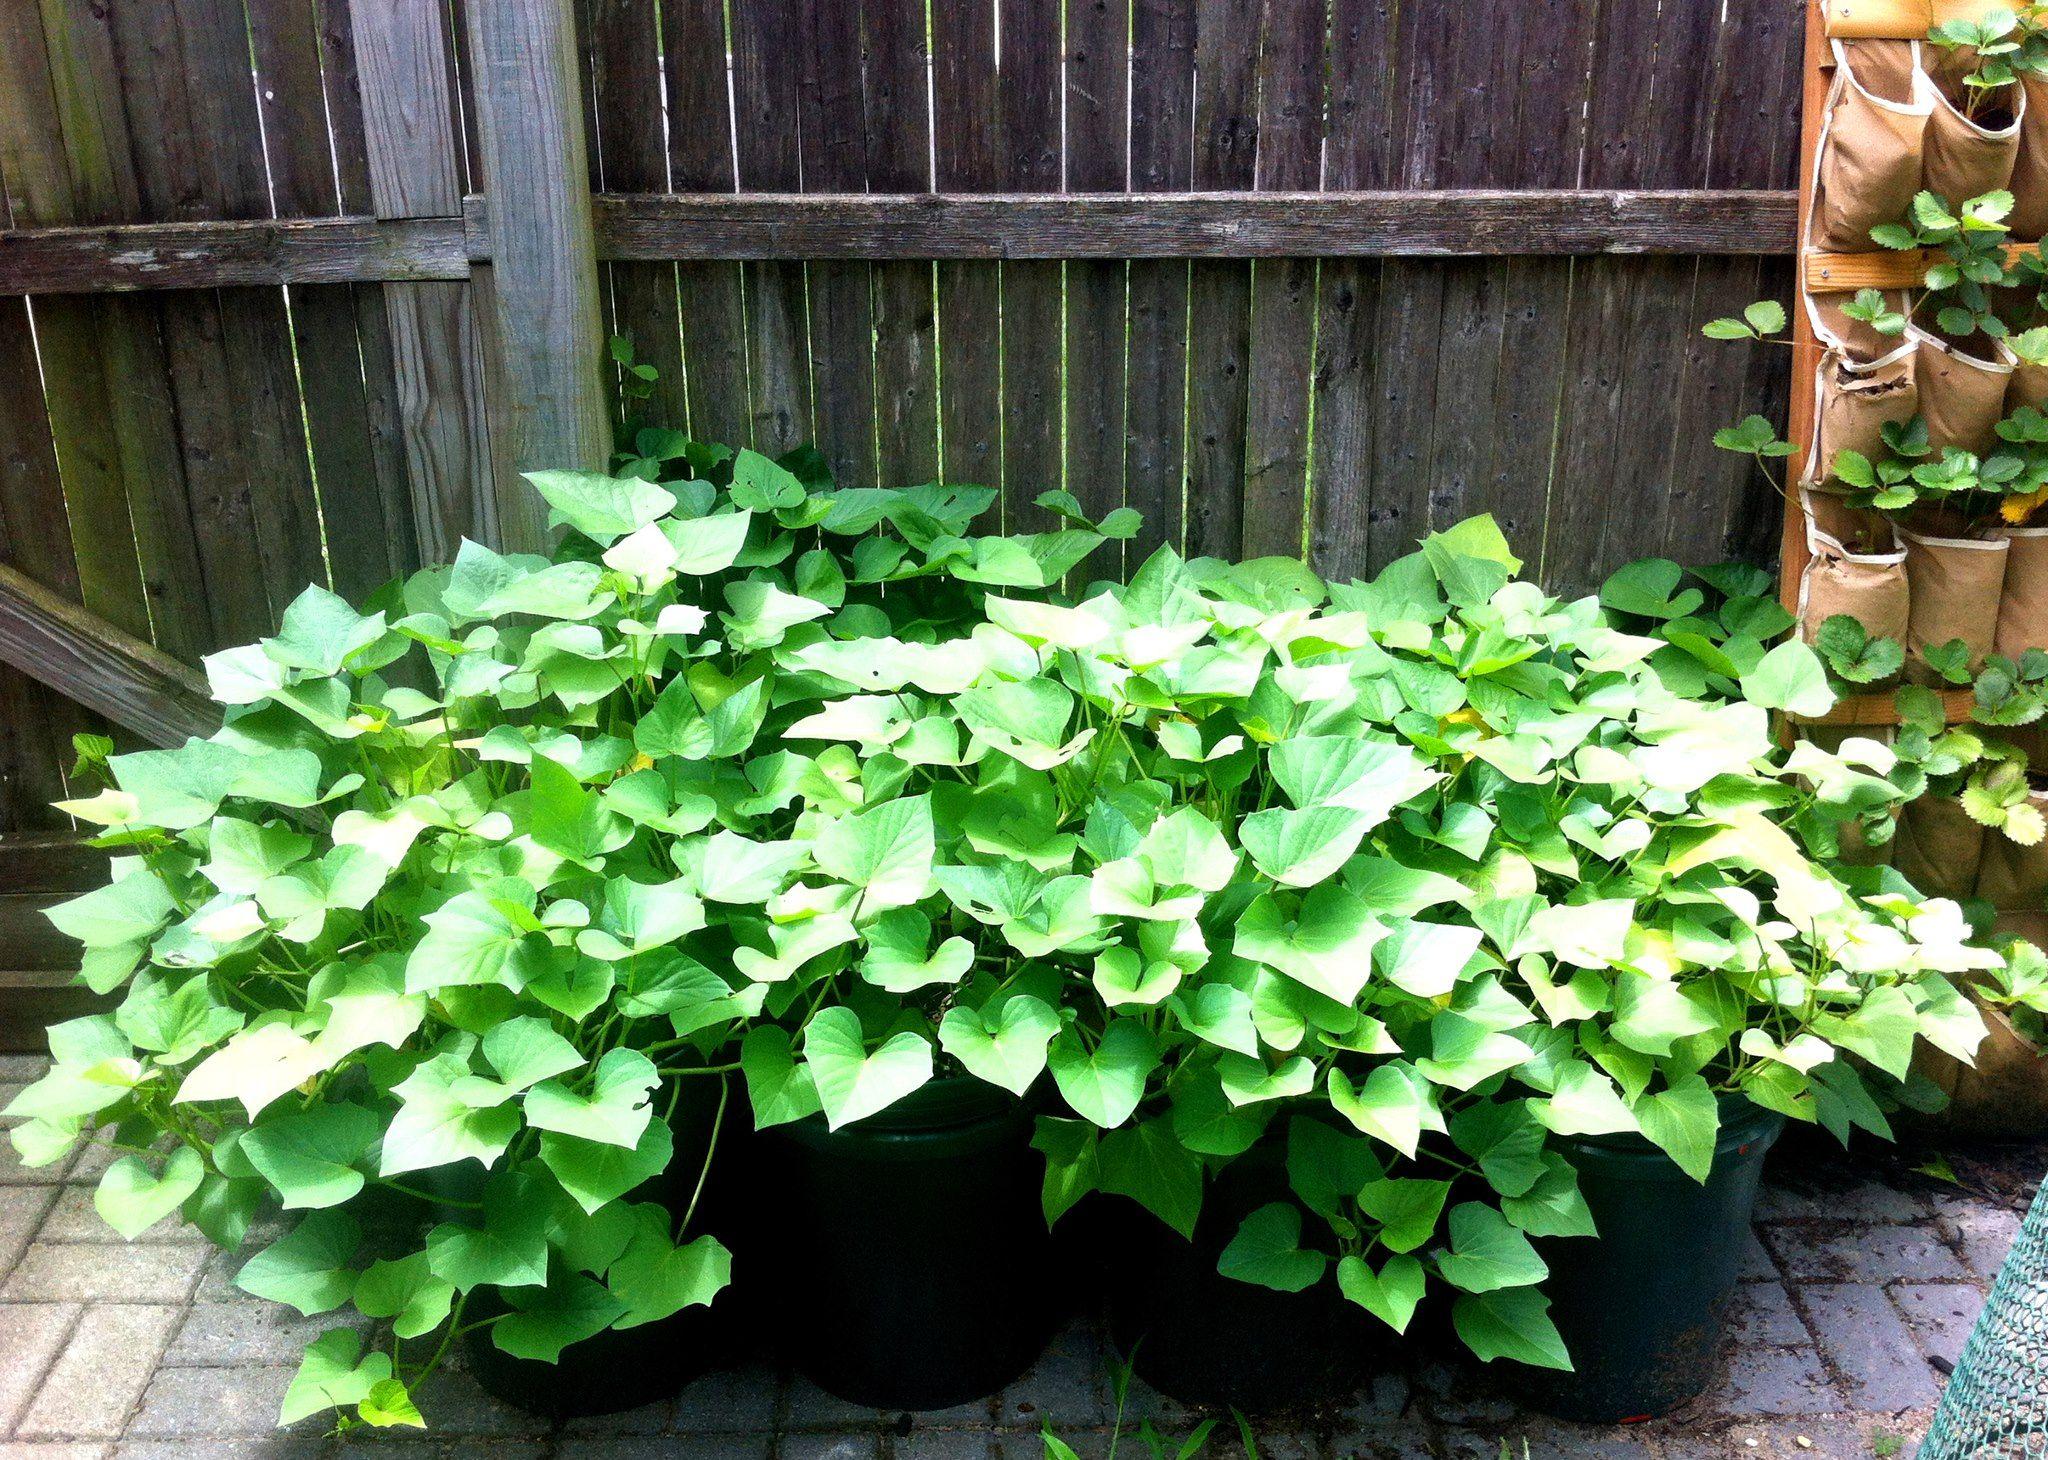 creative way to grow sweet potatoes potatoes grown in 5 gallon